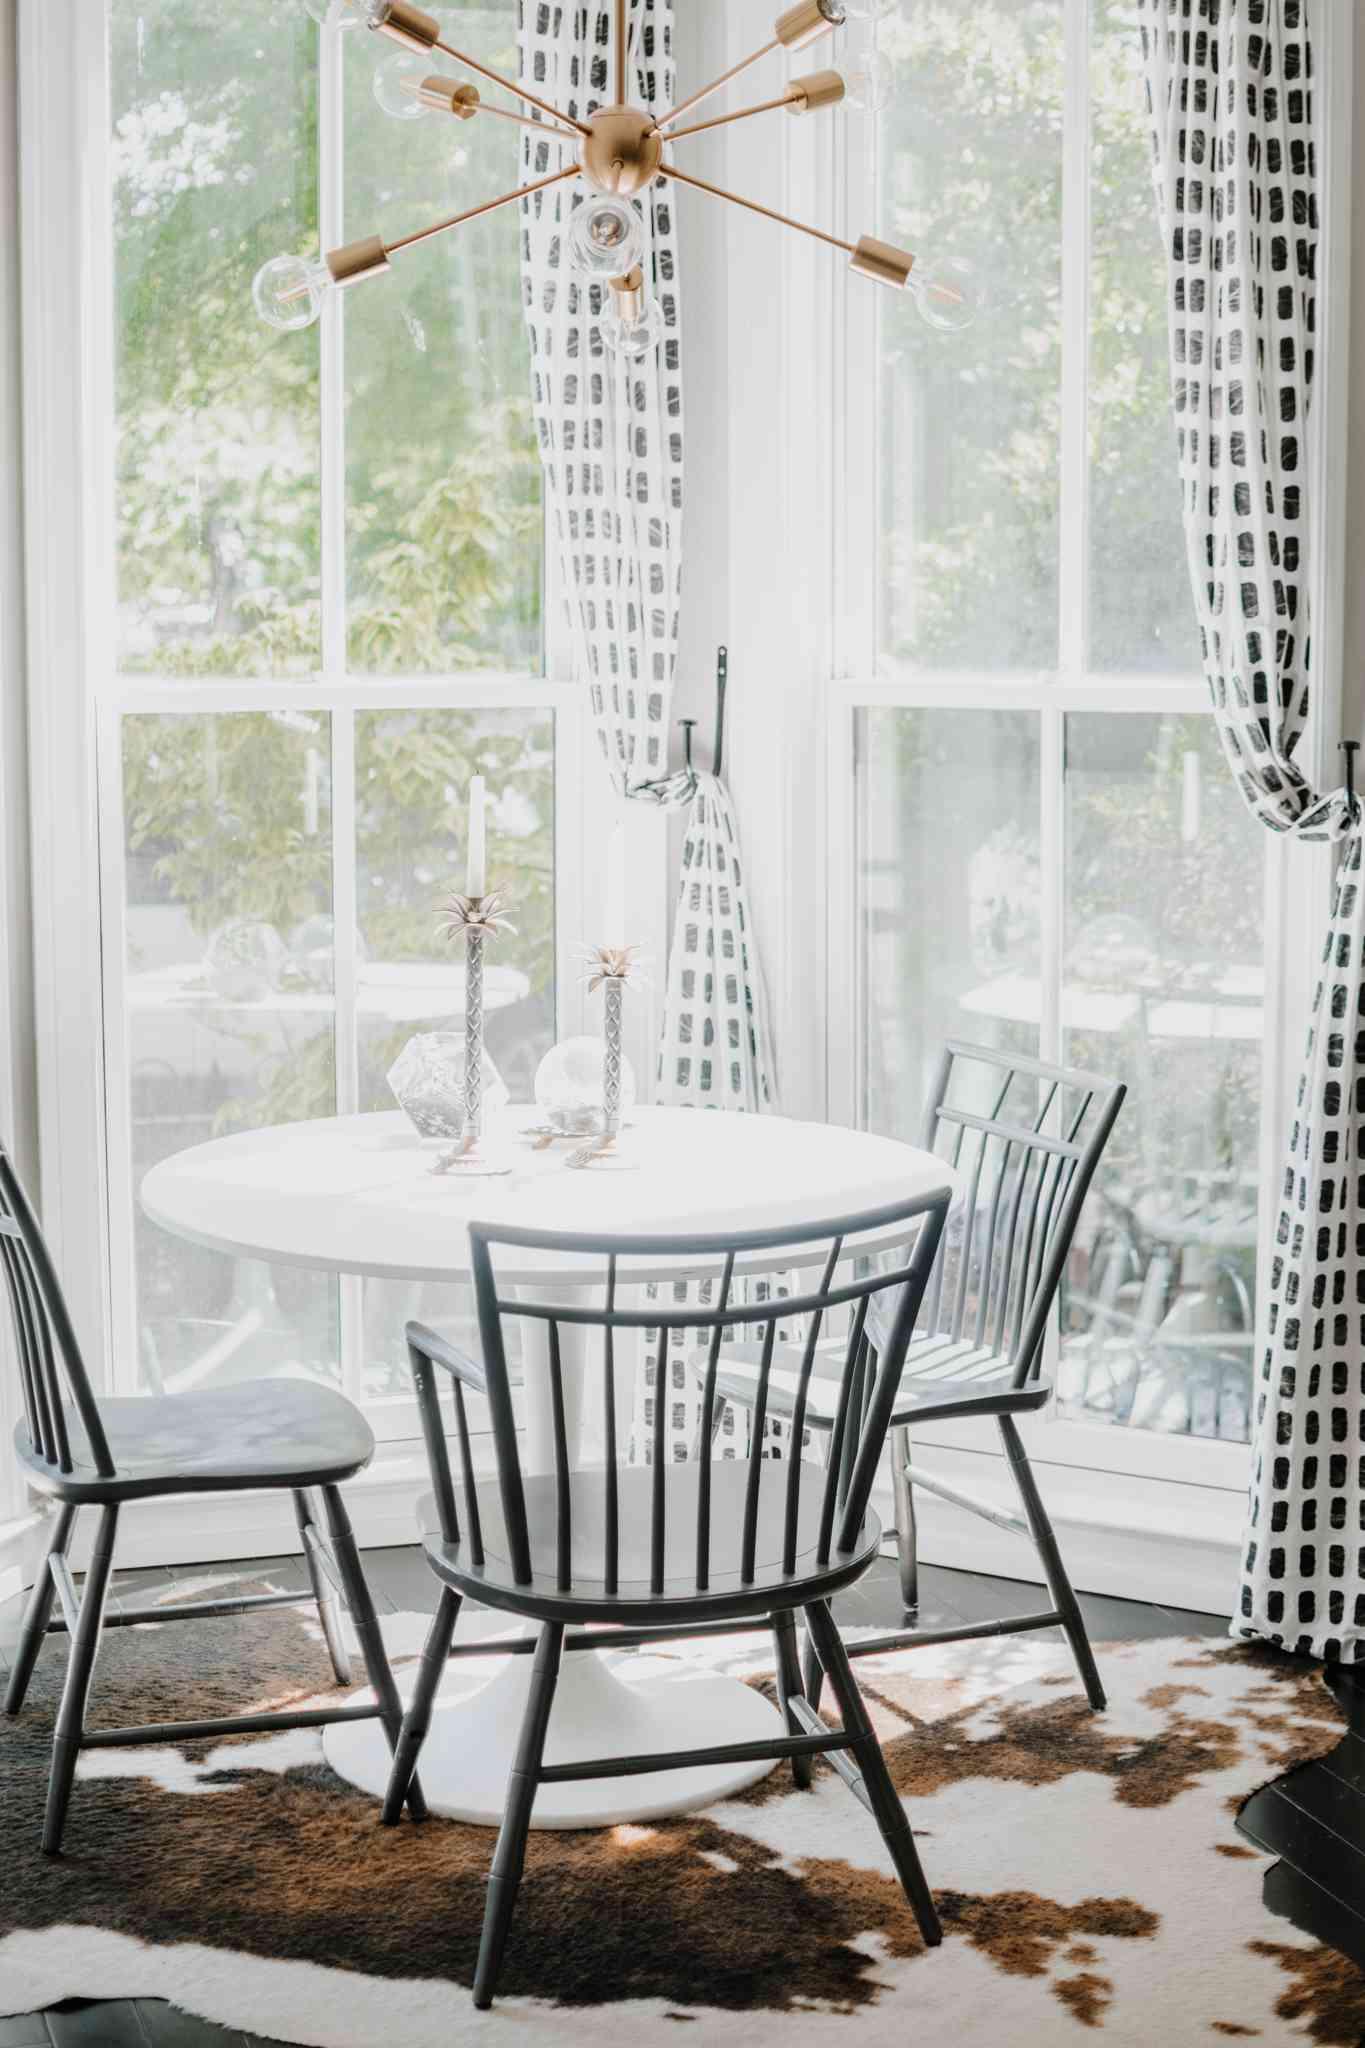 Styled midcentury dining room chairs under Sputnik chandelier.